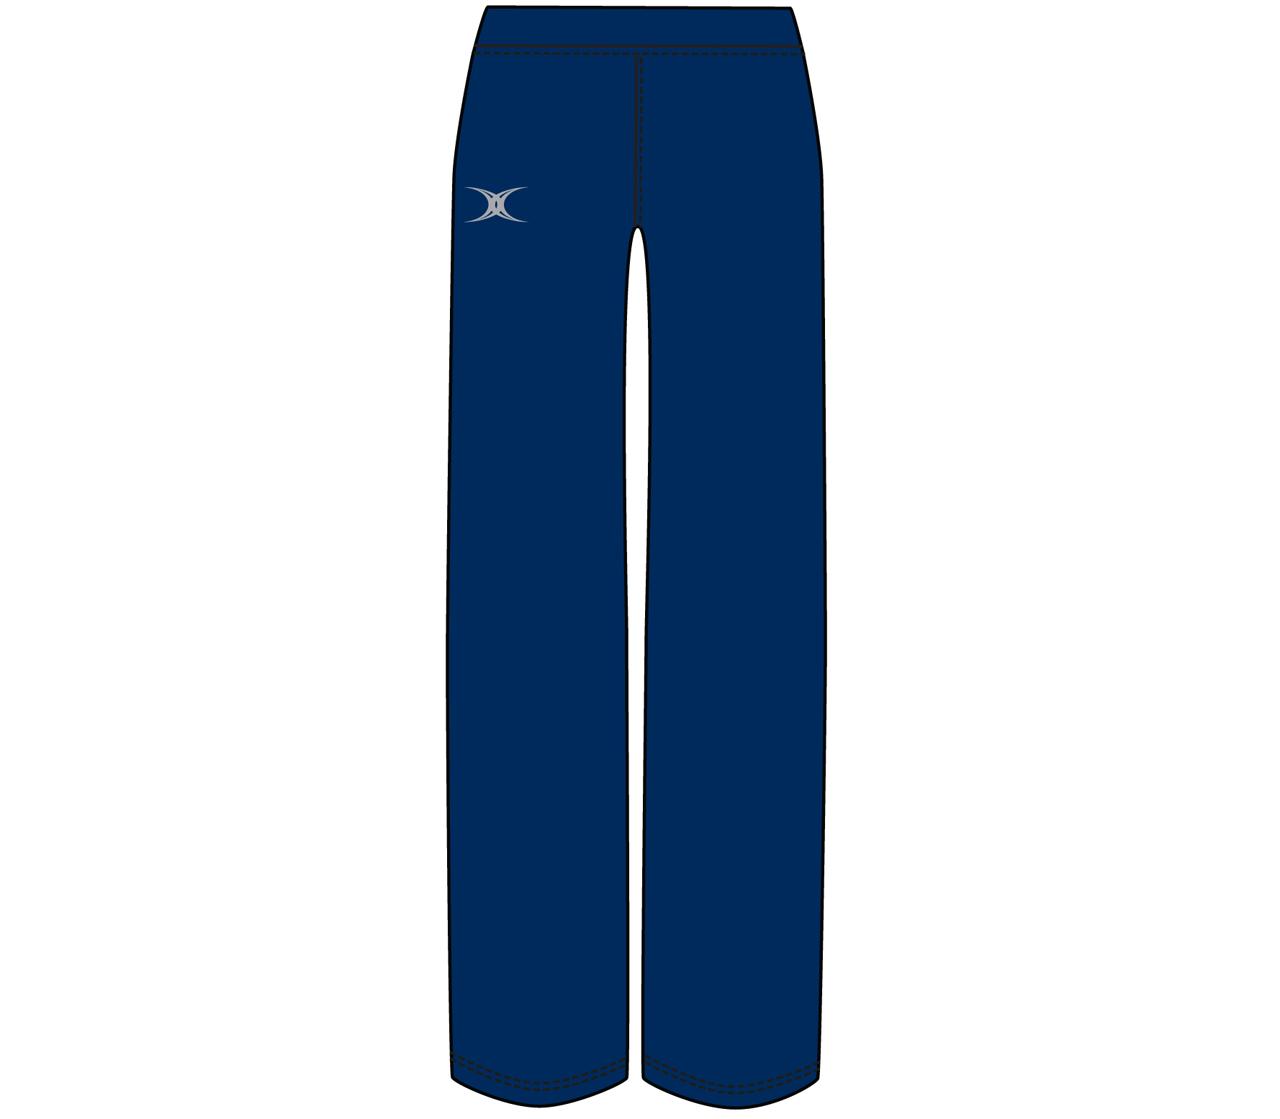 6662c9c6f6067 New Gilbert Netball Sports Vixen Pants Comfort Fit Flat Stretched ...